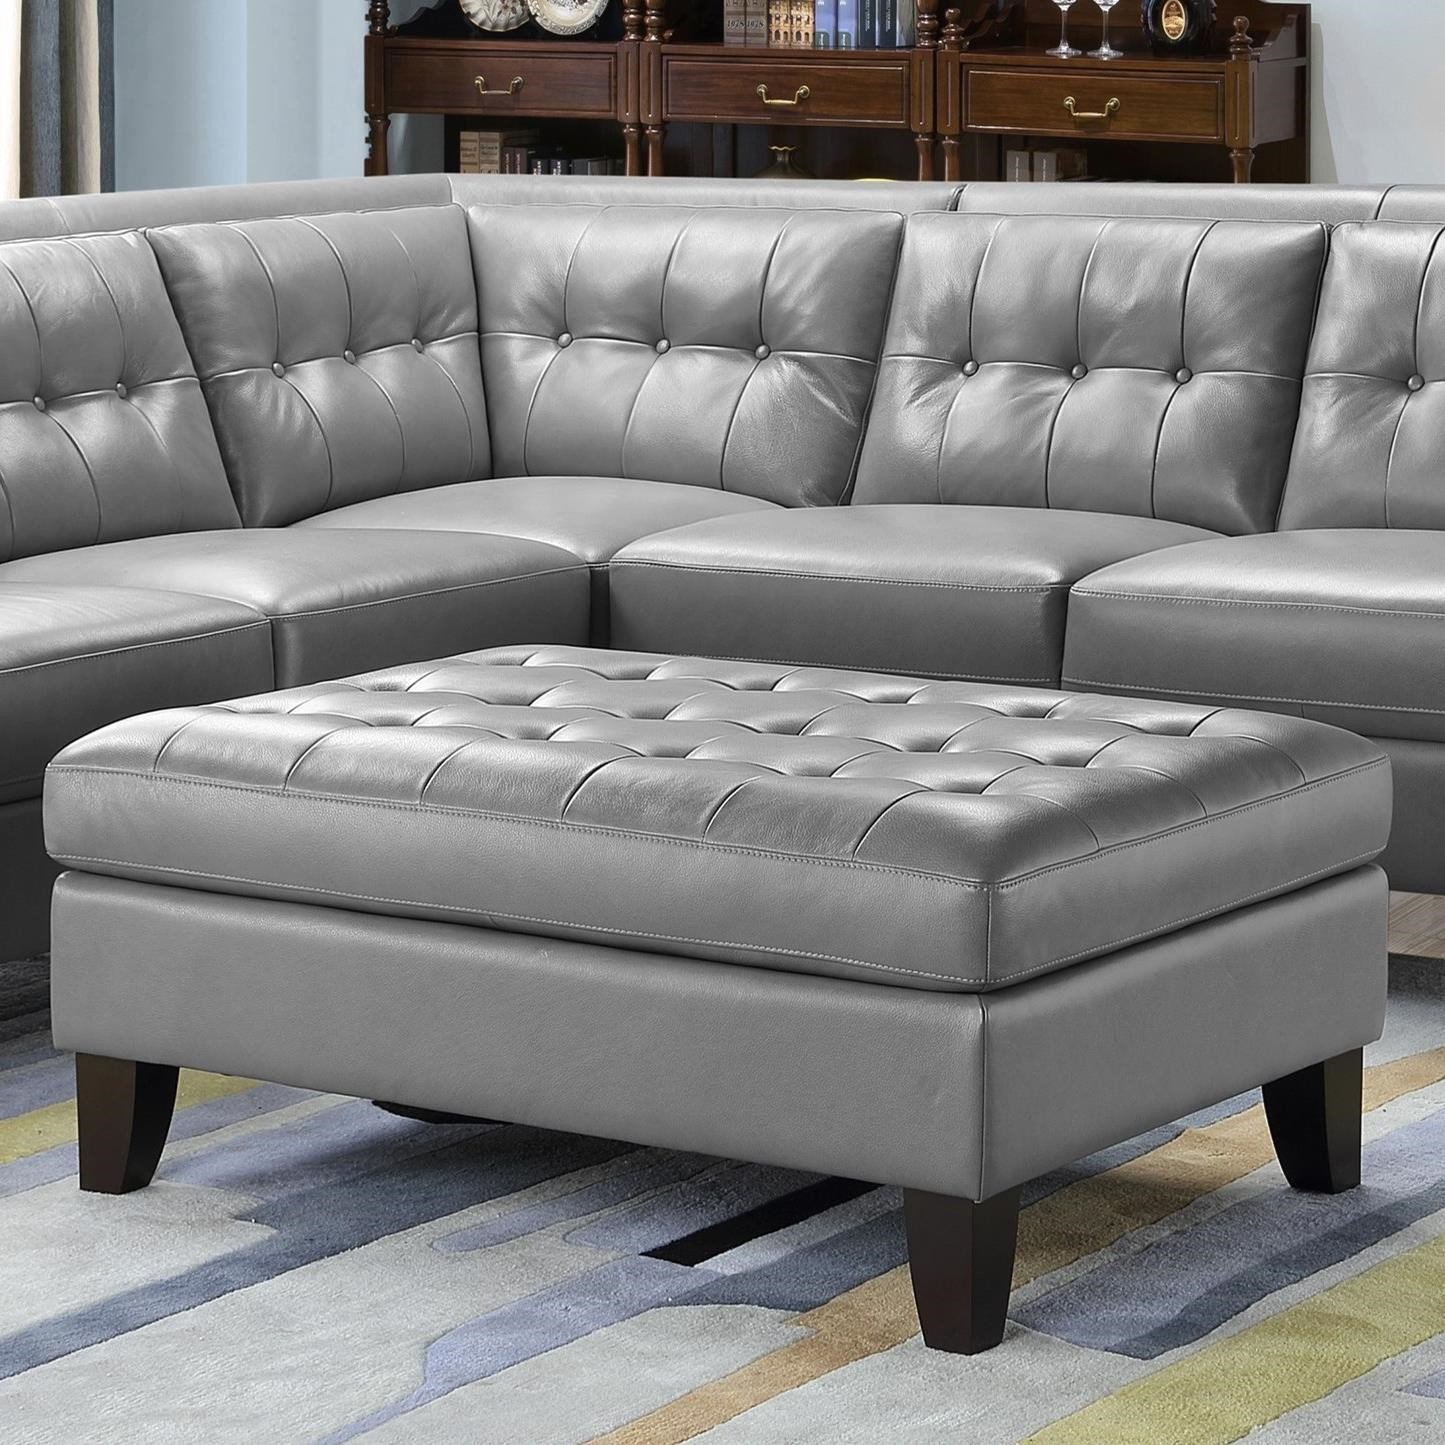 Bedroom Ottoman Storage Bench Luxury Leather Italia Usa Malibu Rectangular Leather Ottoman with